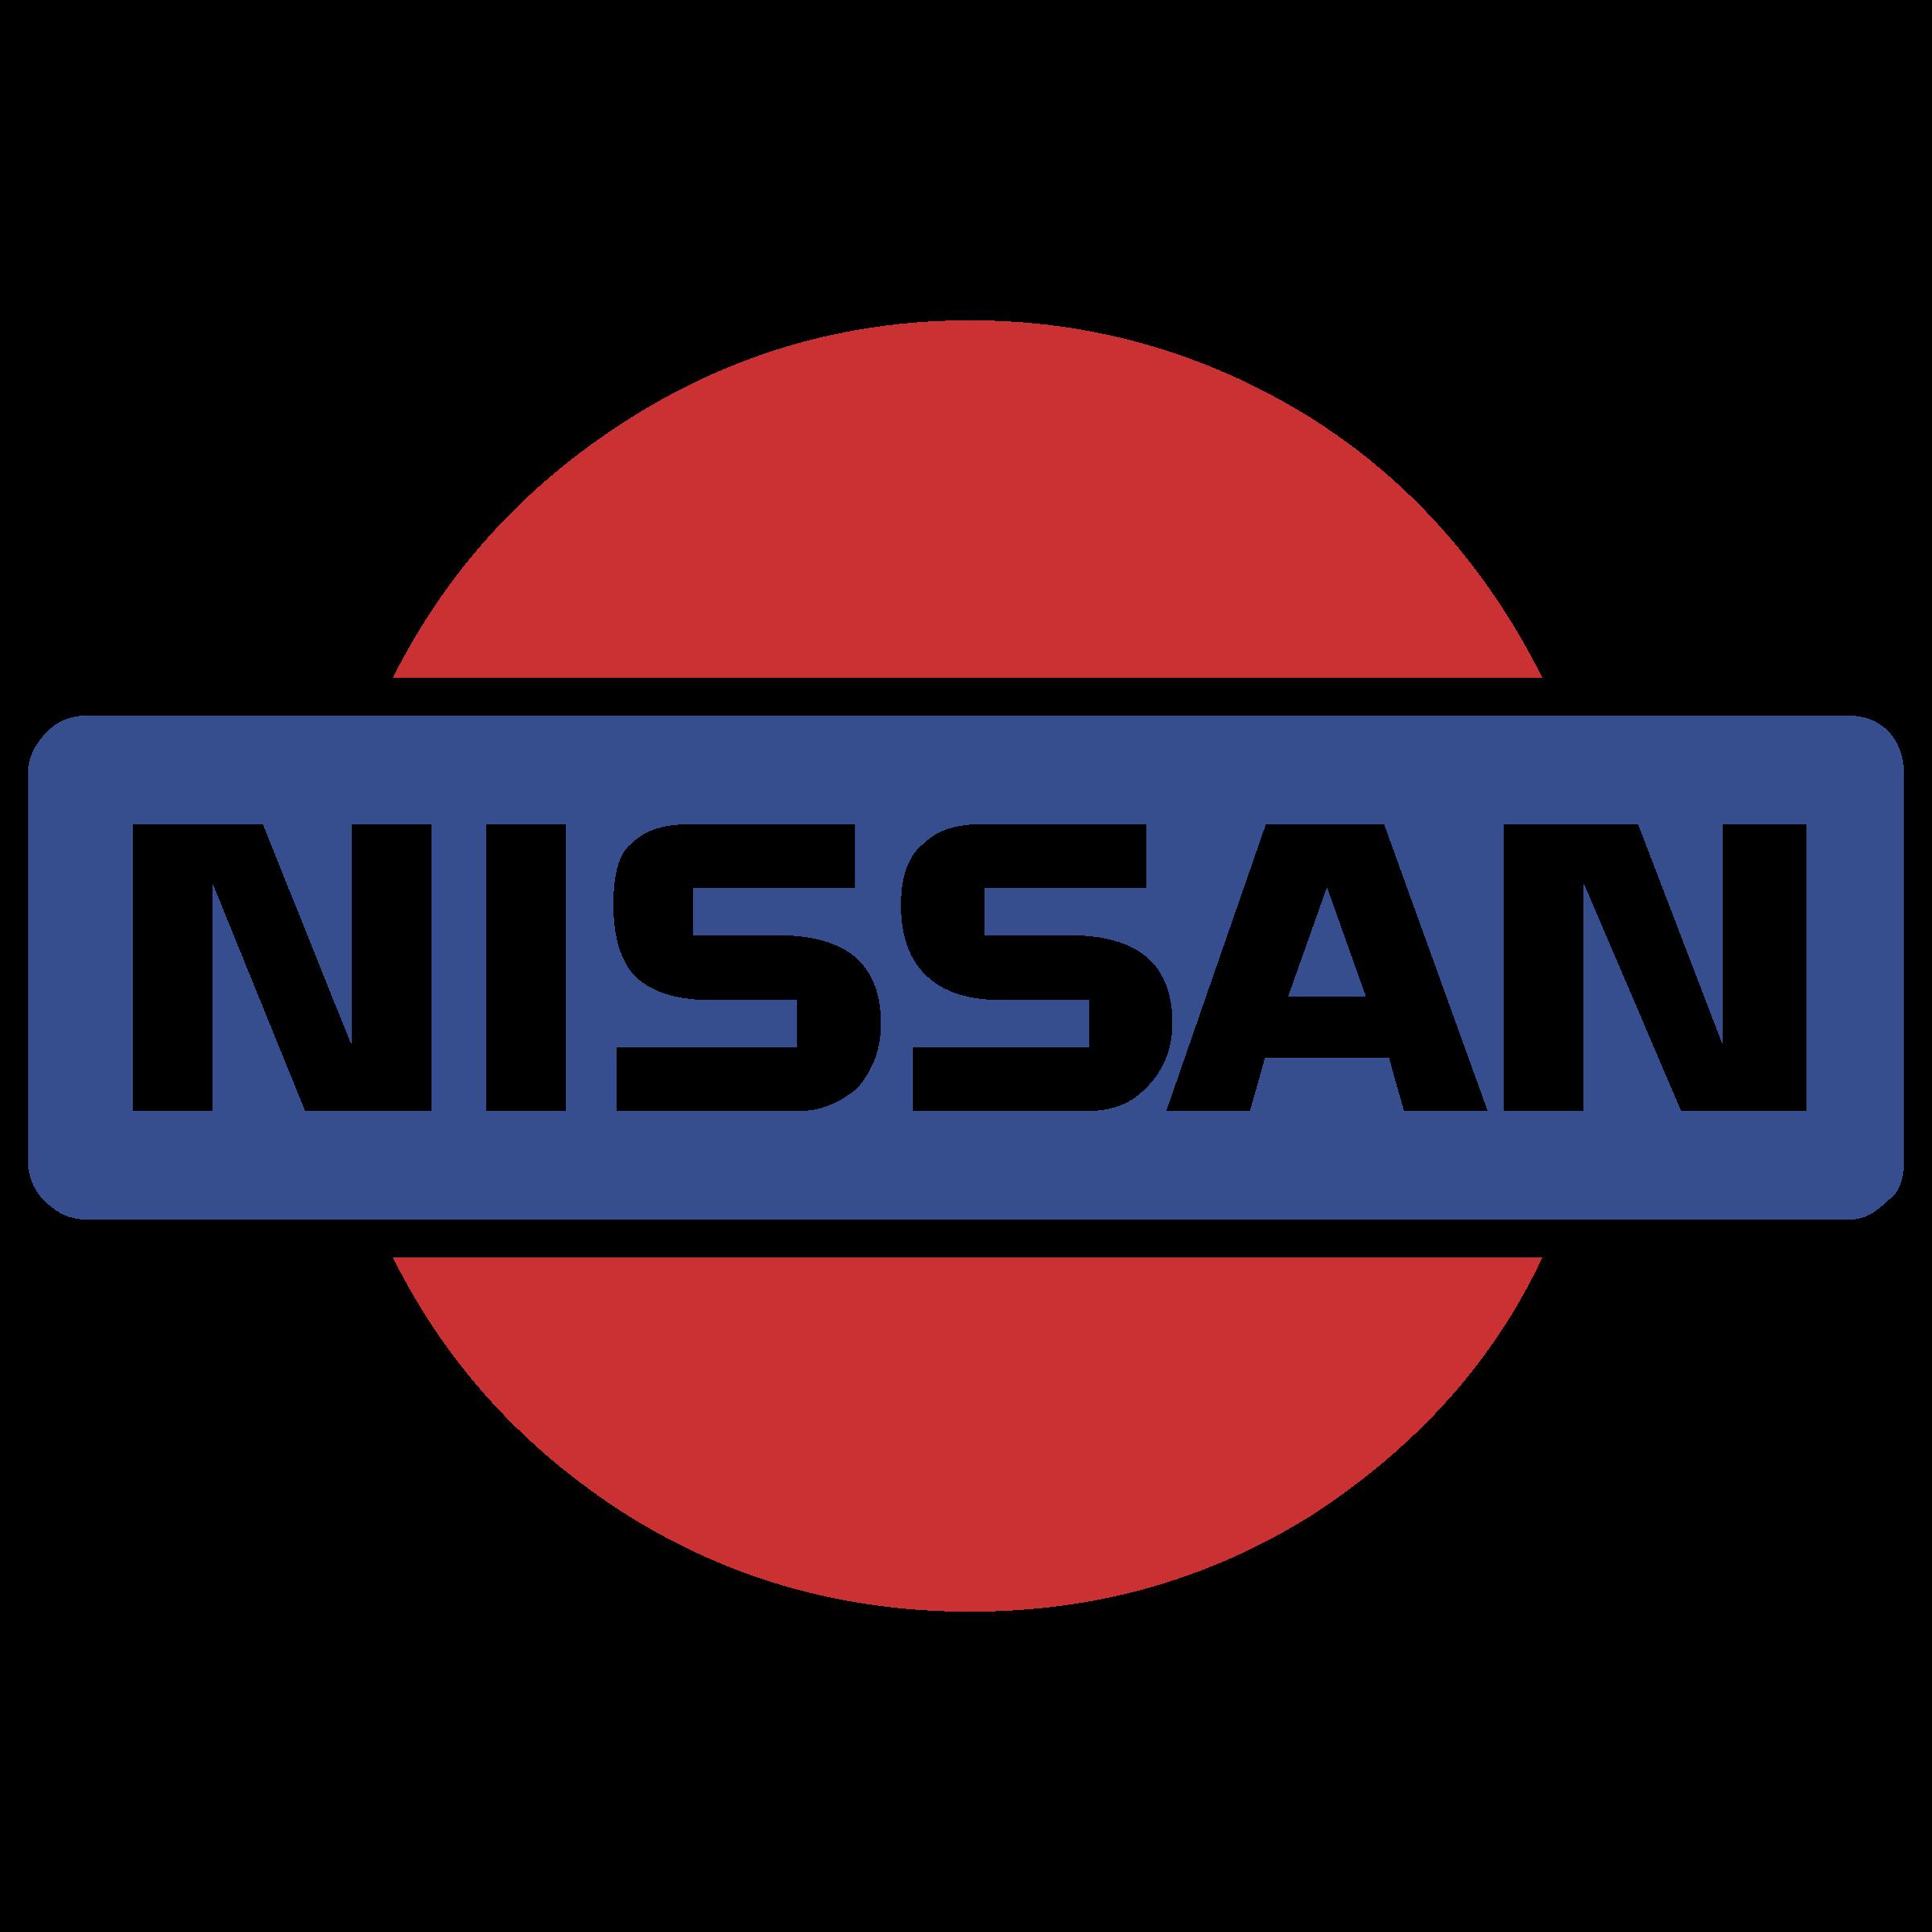 nissan-2-logo-png-transparent